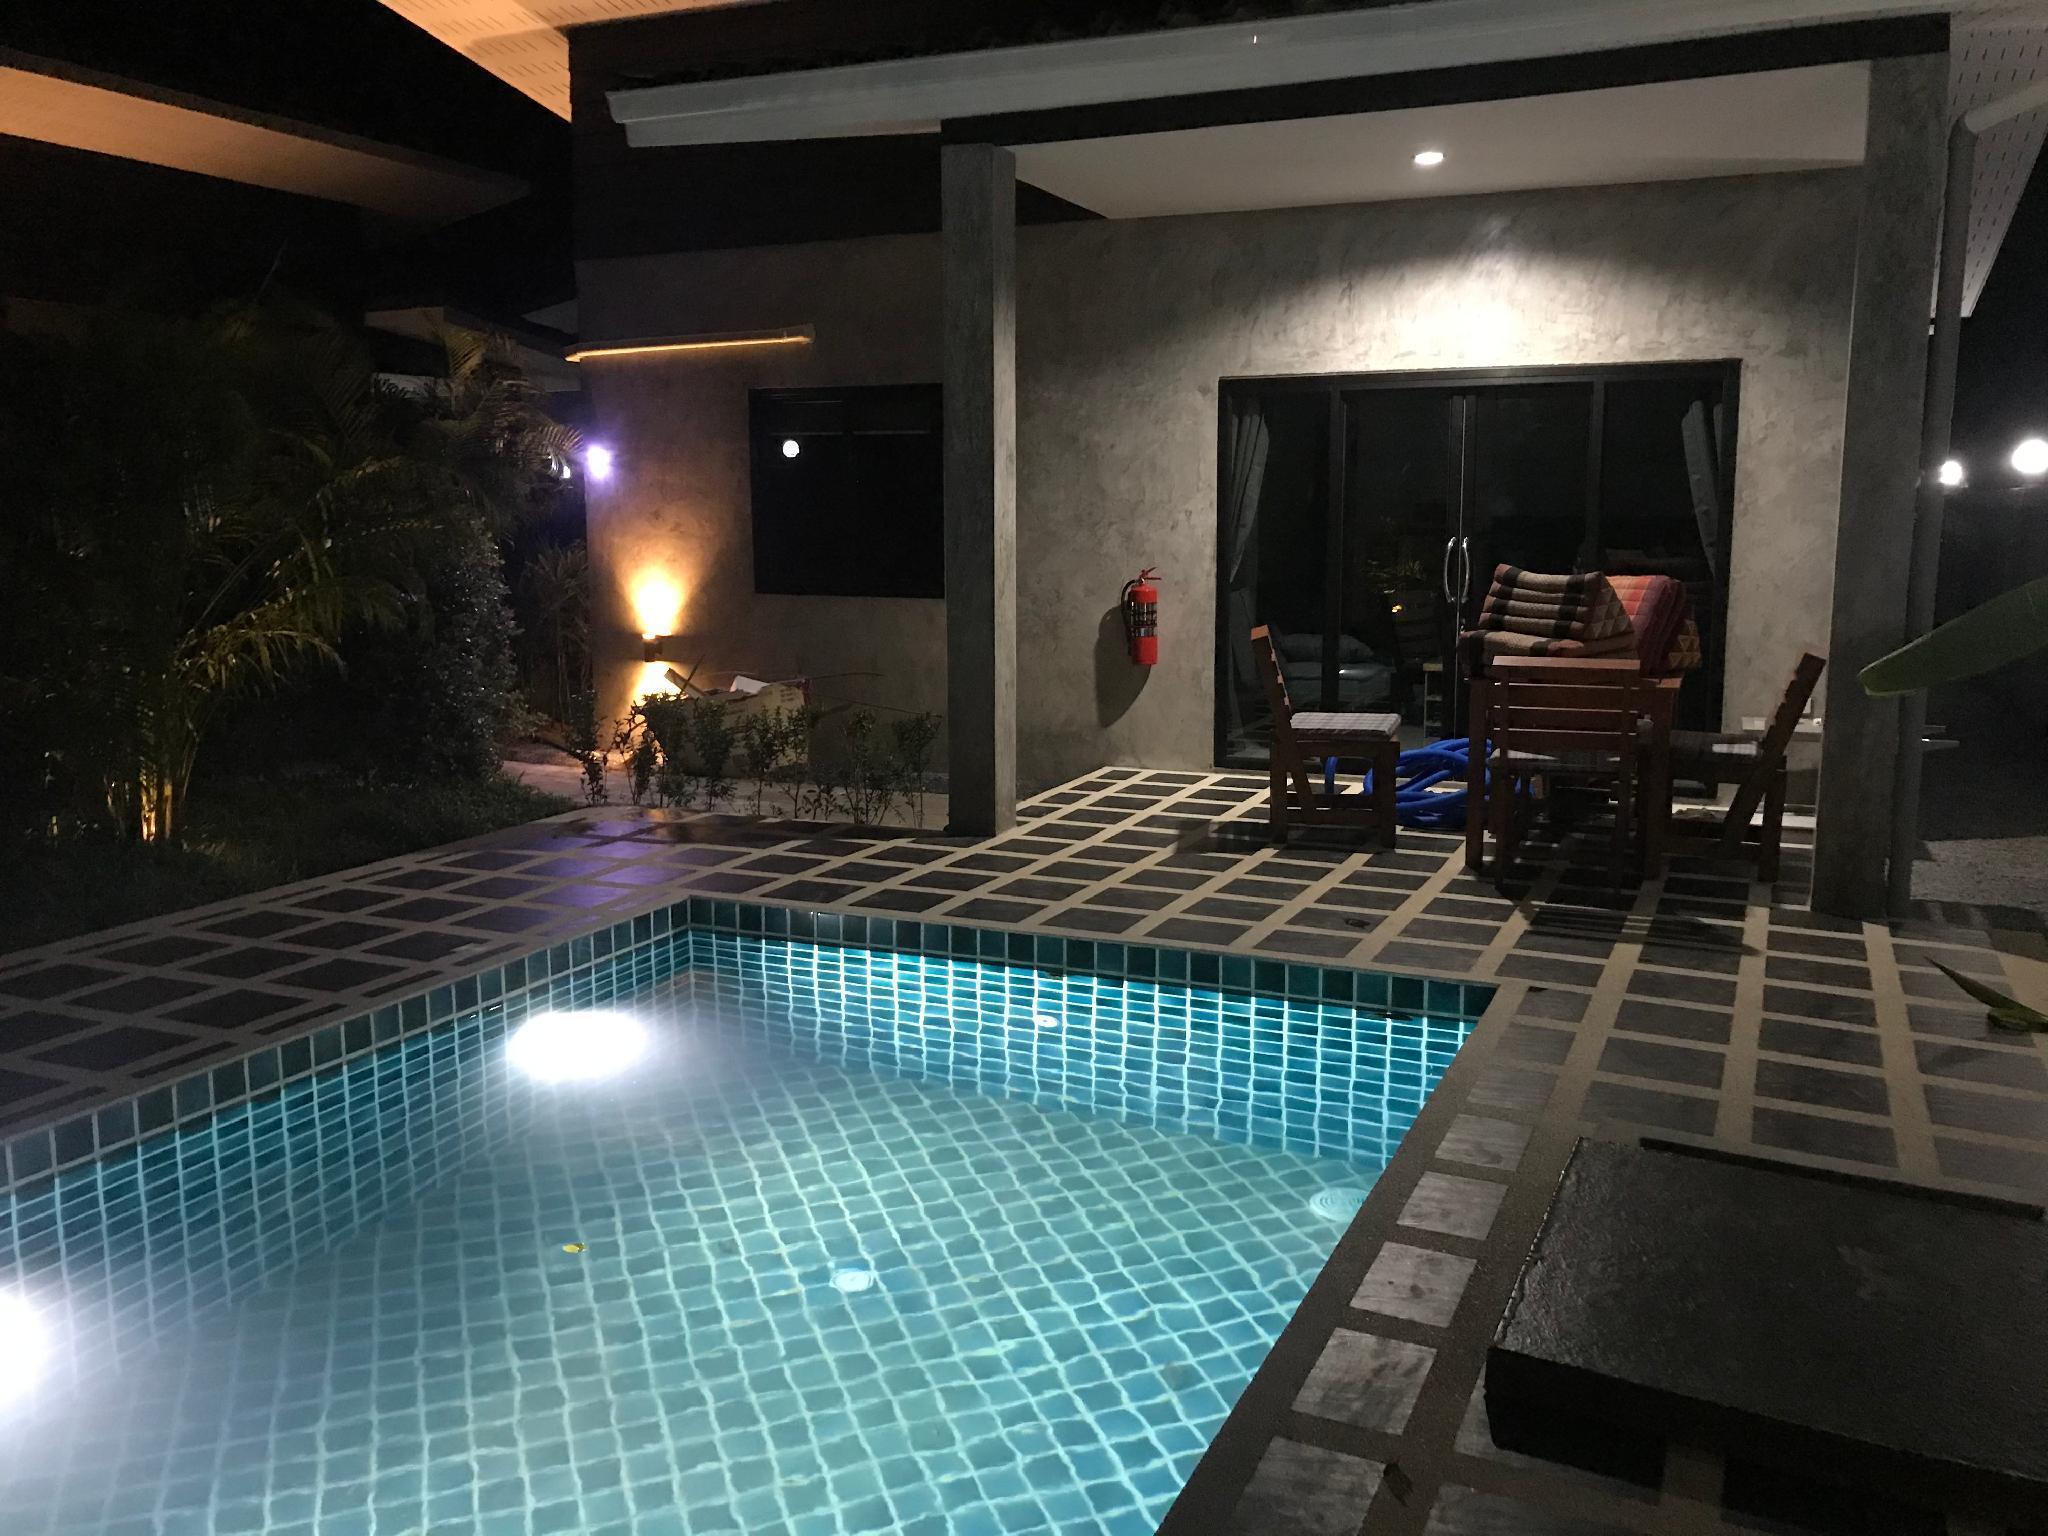 Baan san sabai private pool garden villa M วิลลา 1 ห้องนอน 1 ห้องน้ำส่วนตัว ขนาด 42 ตร.ม. – หาดพระแอะ